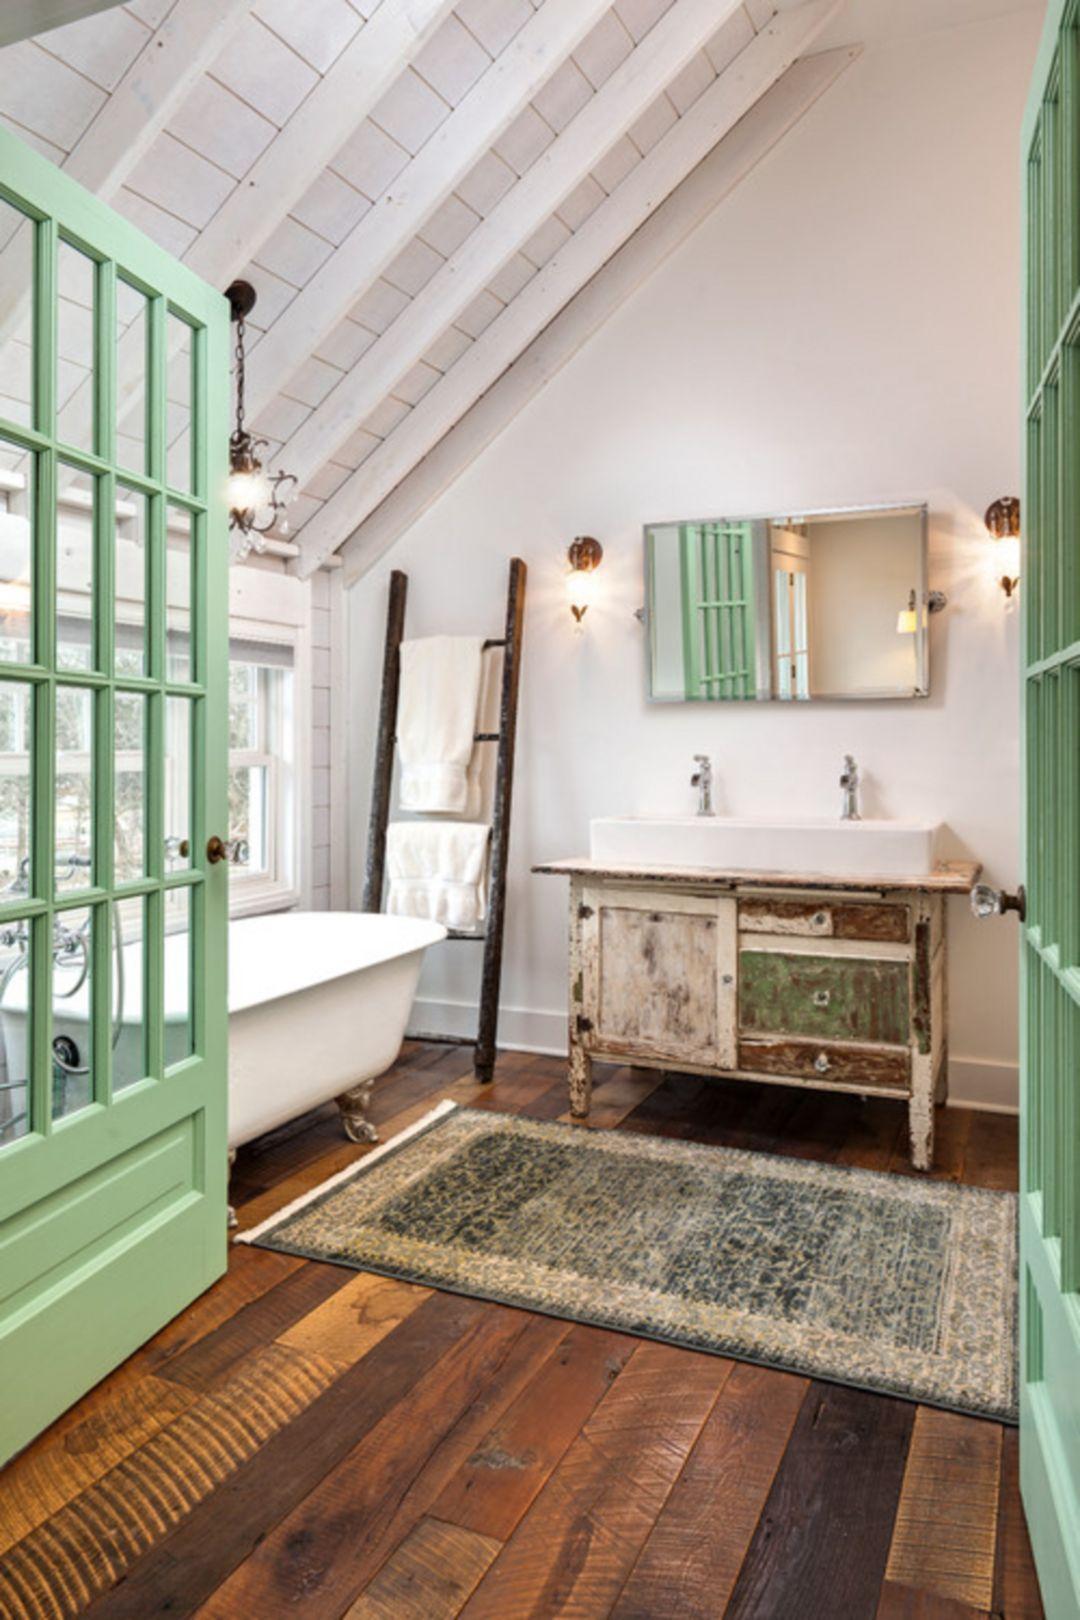 15 Wonderful Farmhouse Bathroom Design and Decor Ideas You ...